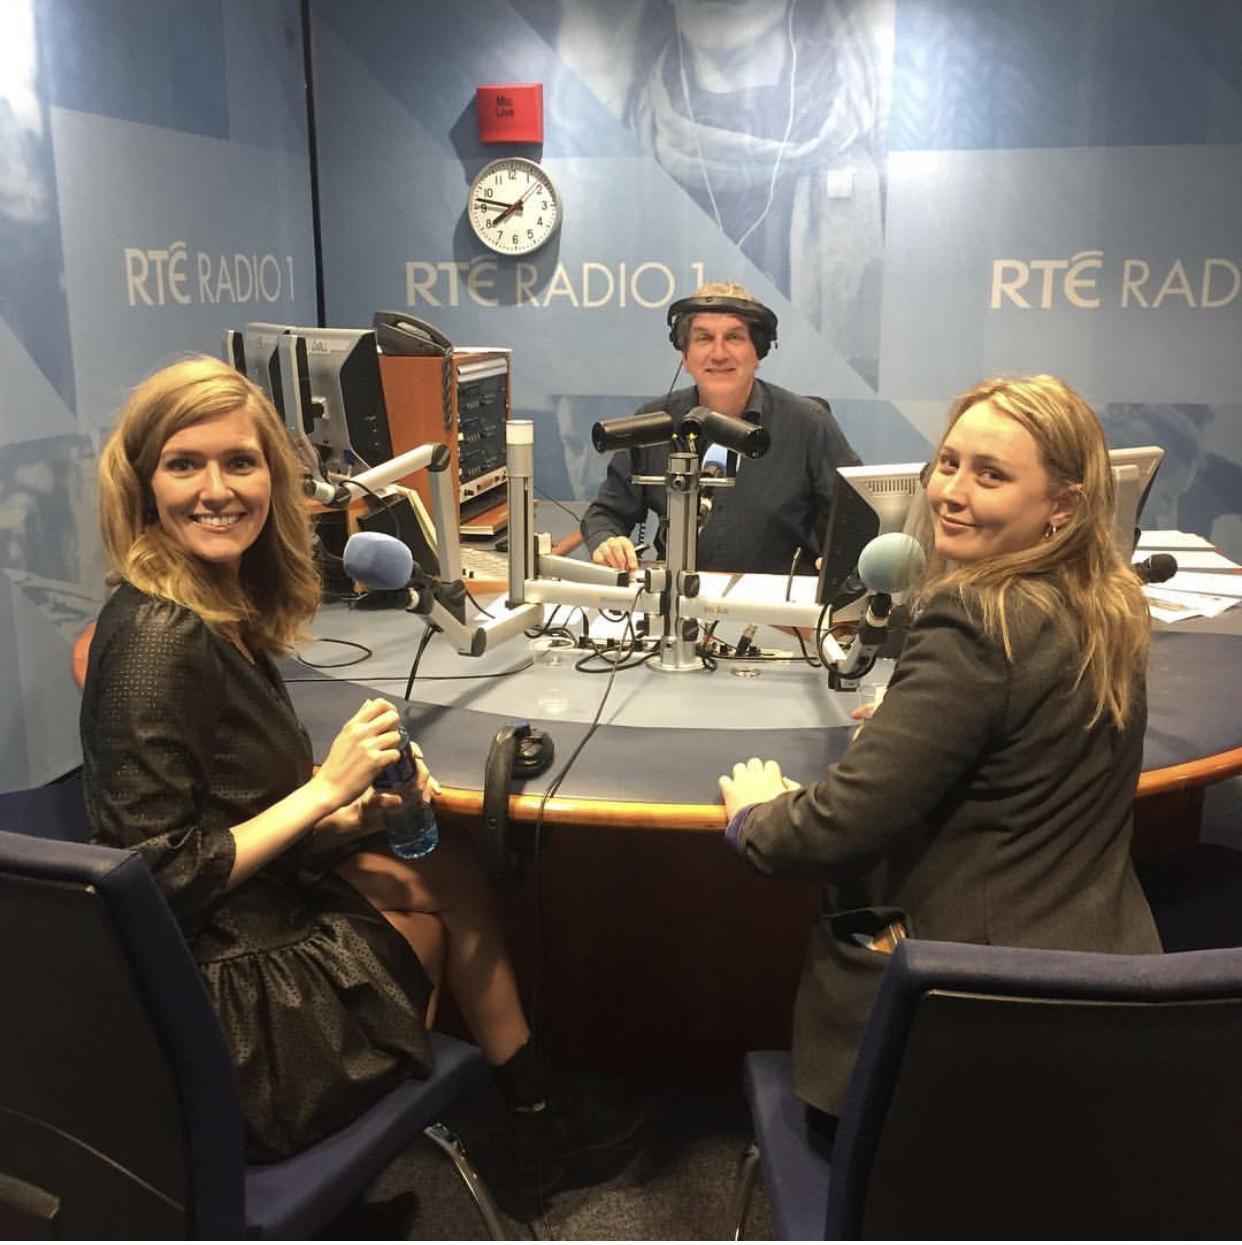 RTE - RADIO 1- ARENA ARTS SHOW